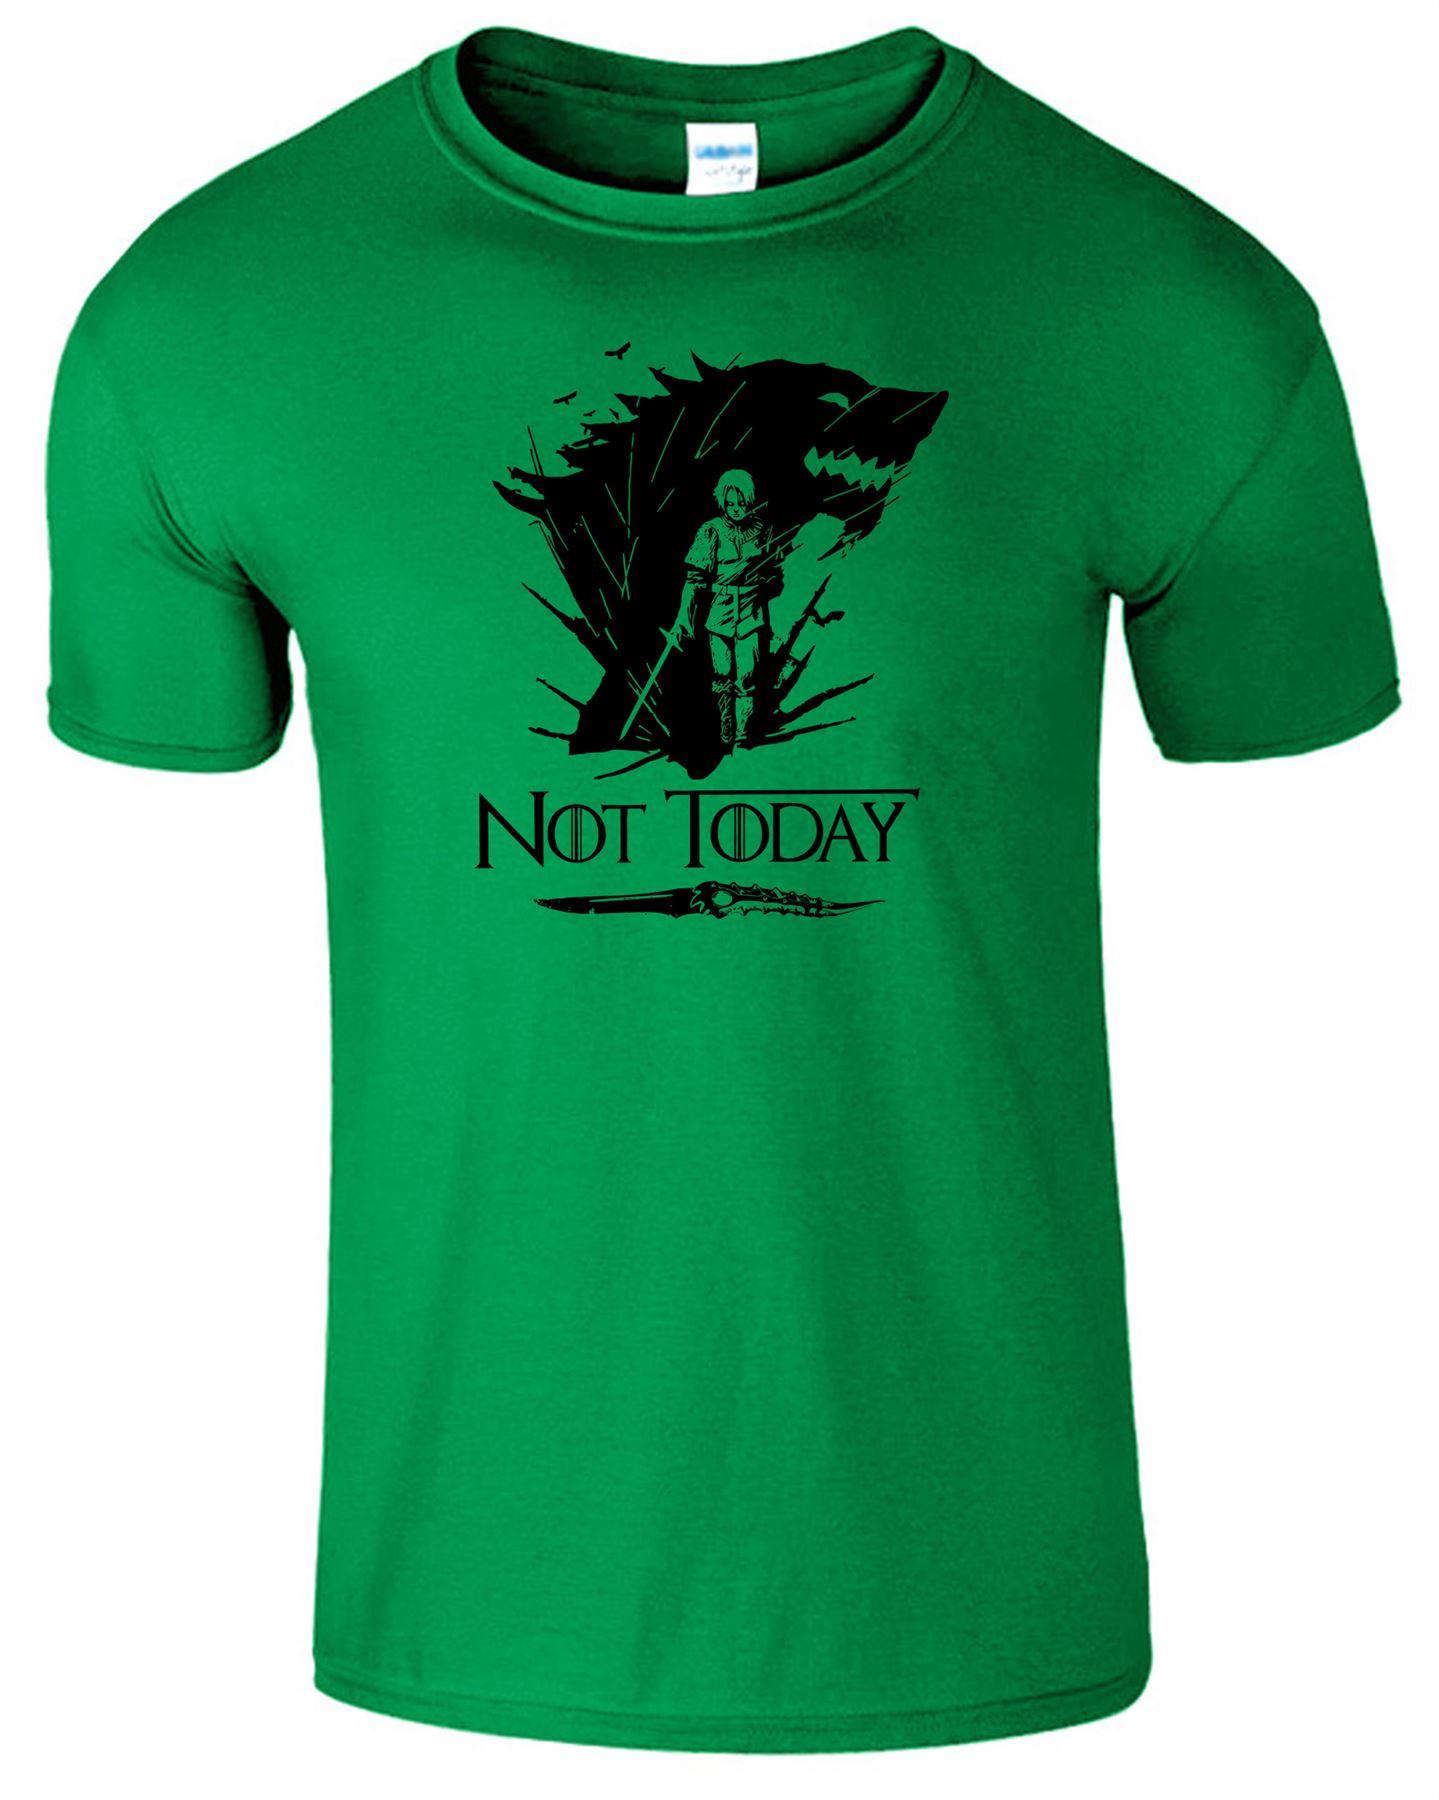 Arya-Stark-Not-Today-T-Shirt-Mens-Game-Season-Womens-Shirt-Adults-Unisex-Fit Indexbild 23